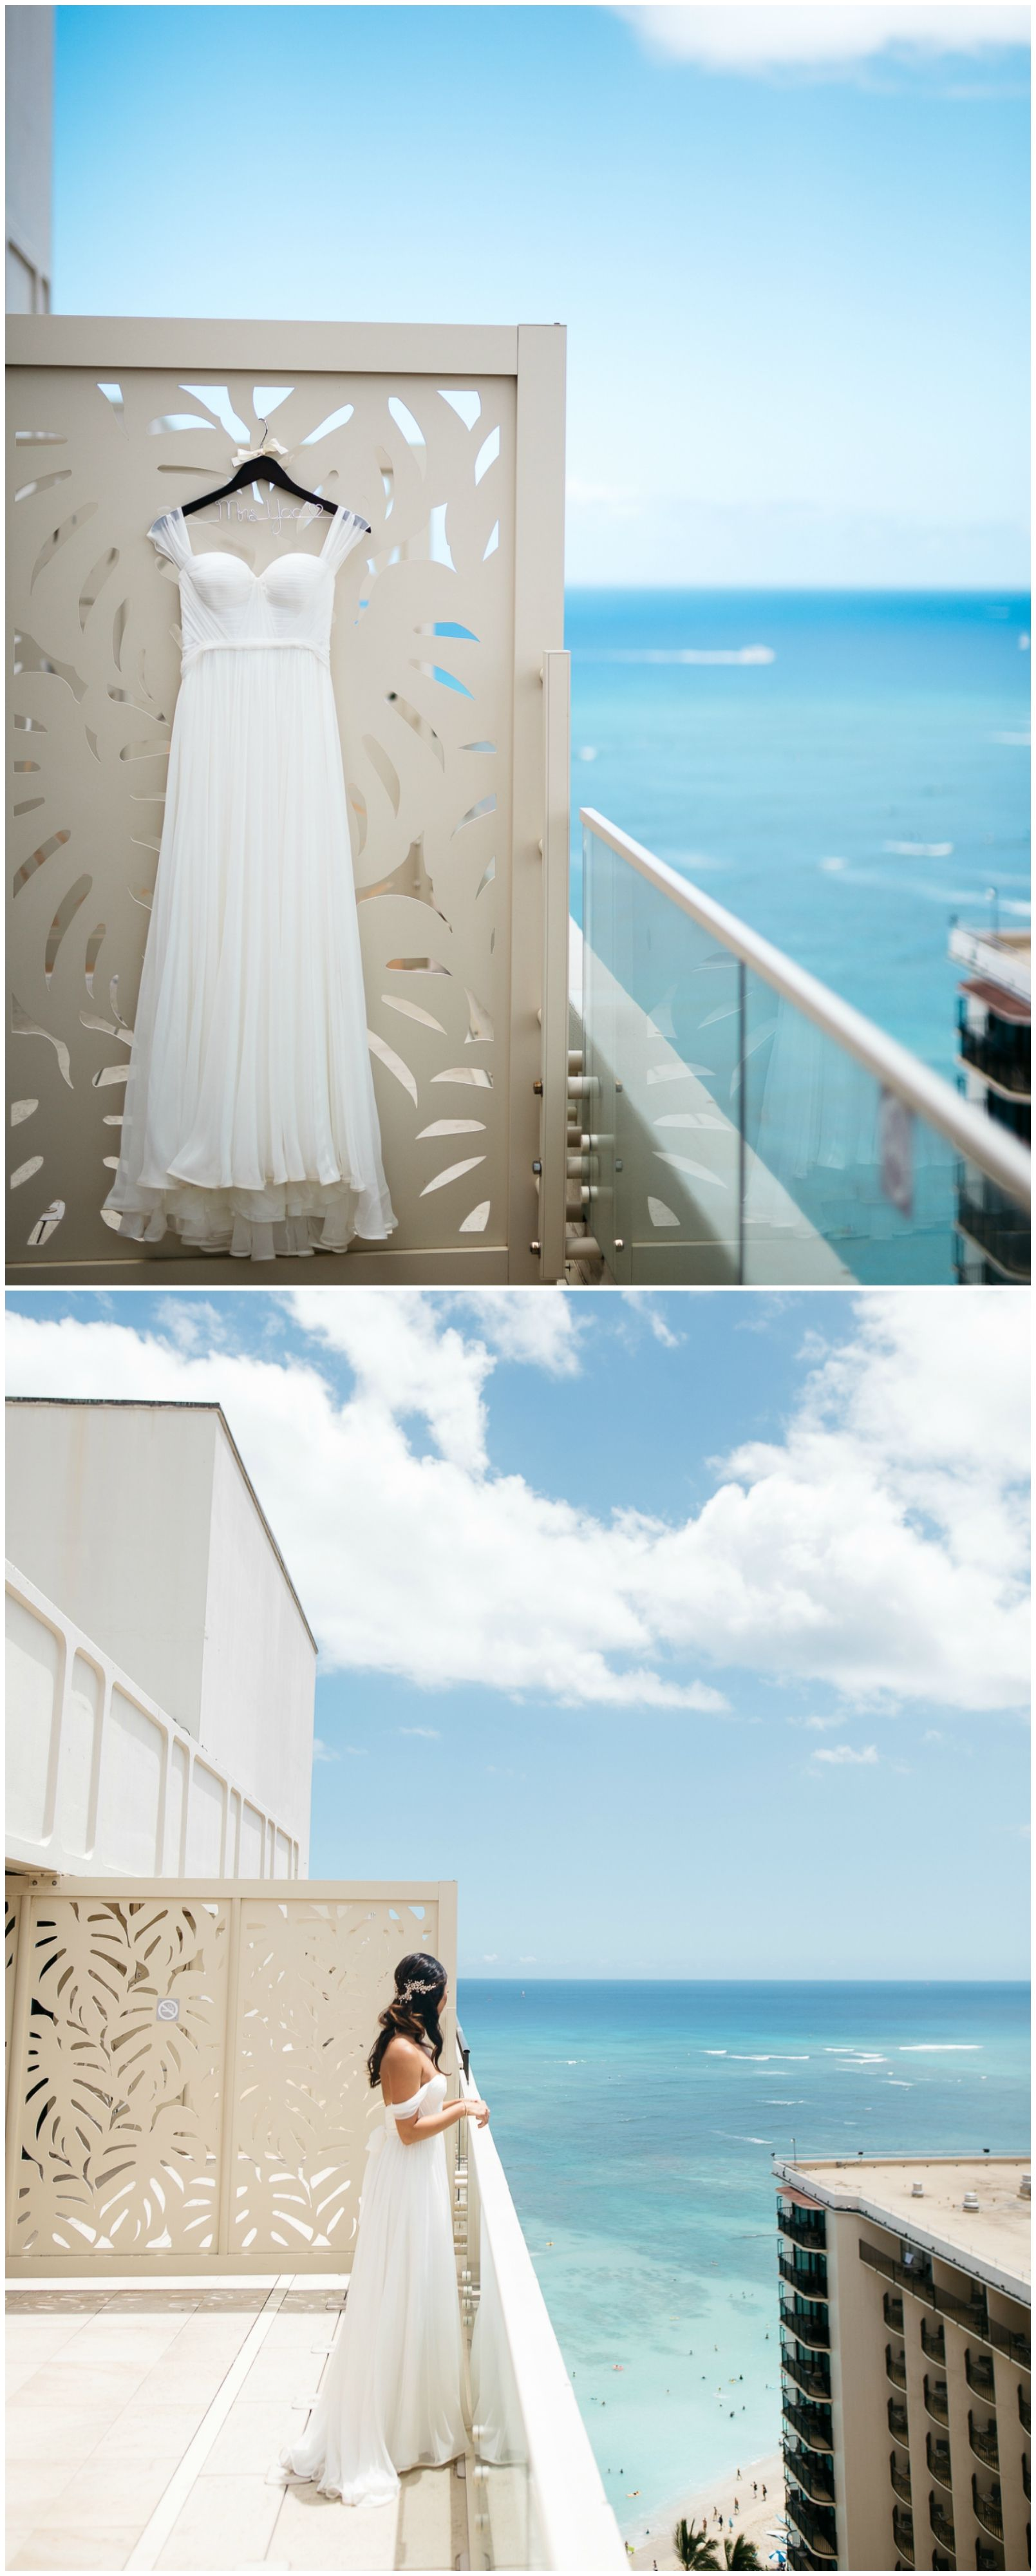 Breezy wedding dress, light fabric, off-the-shoulder sleeves, beach wedding fashion, Hawaii // Makai Creative